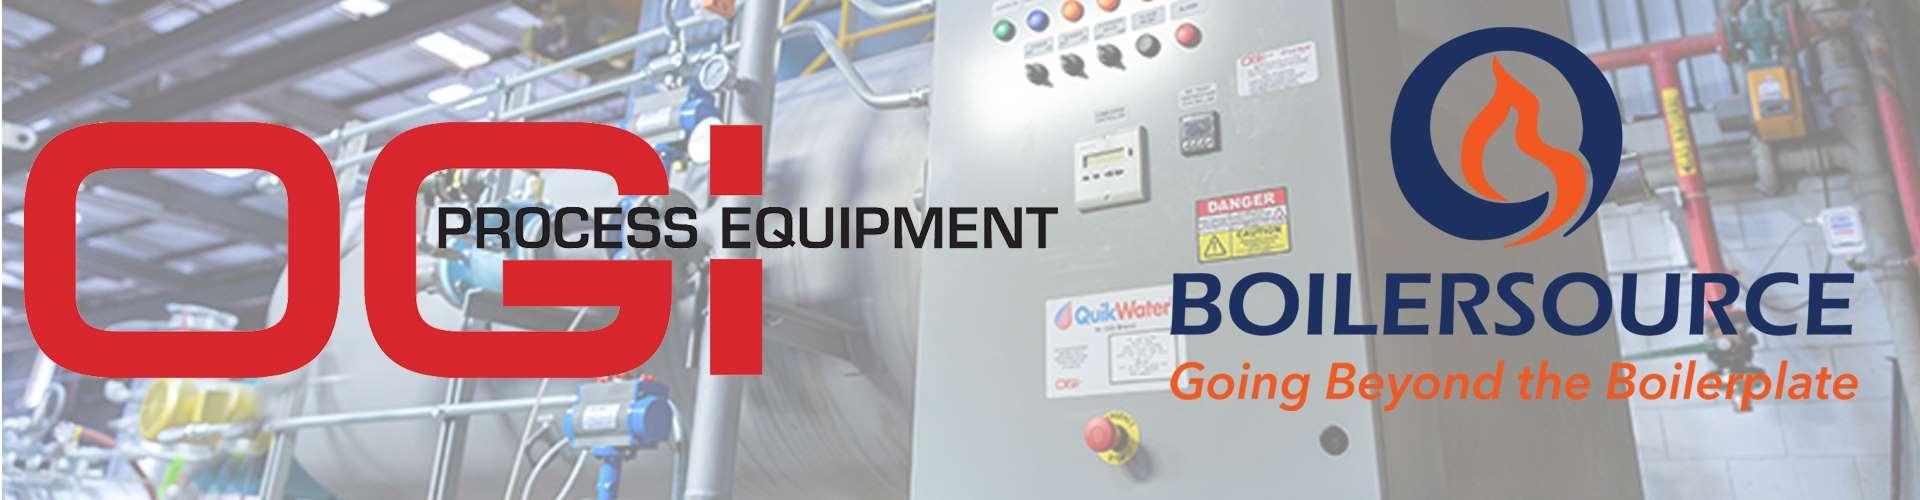 OGI Boilersource Partnership